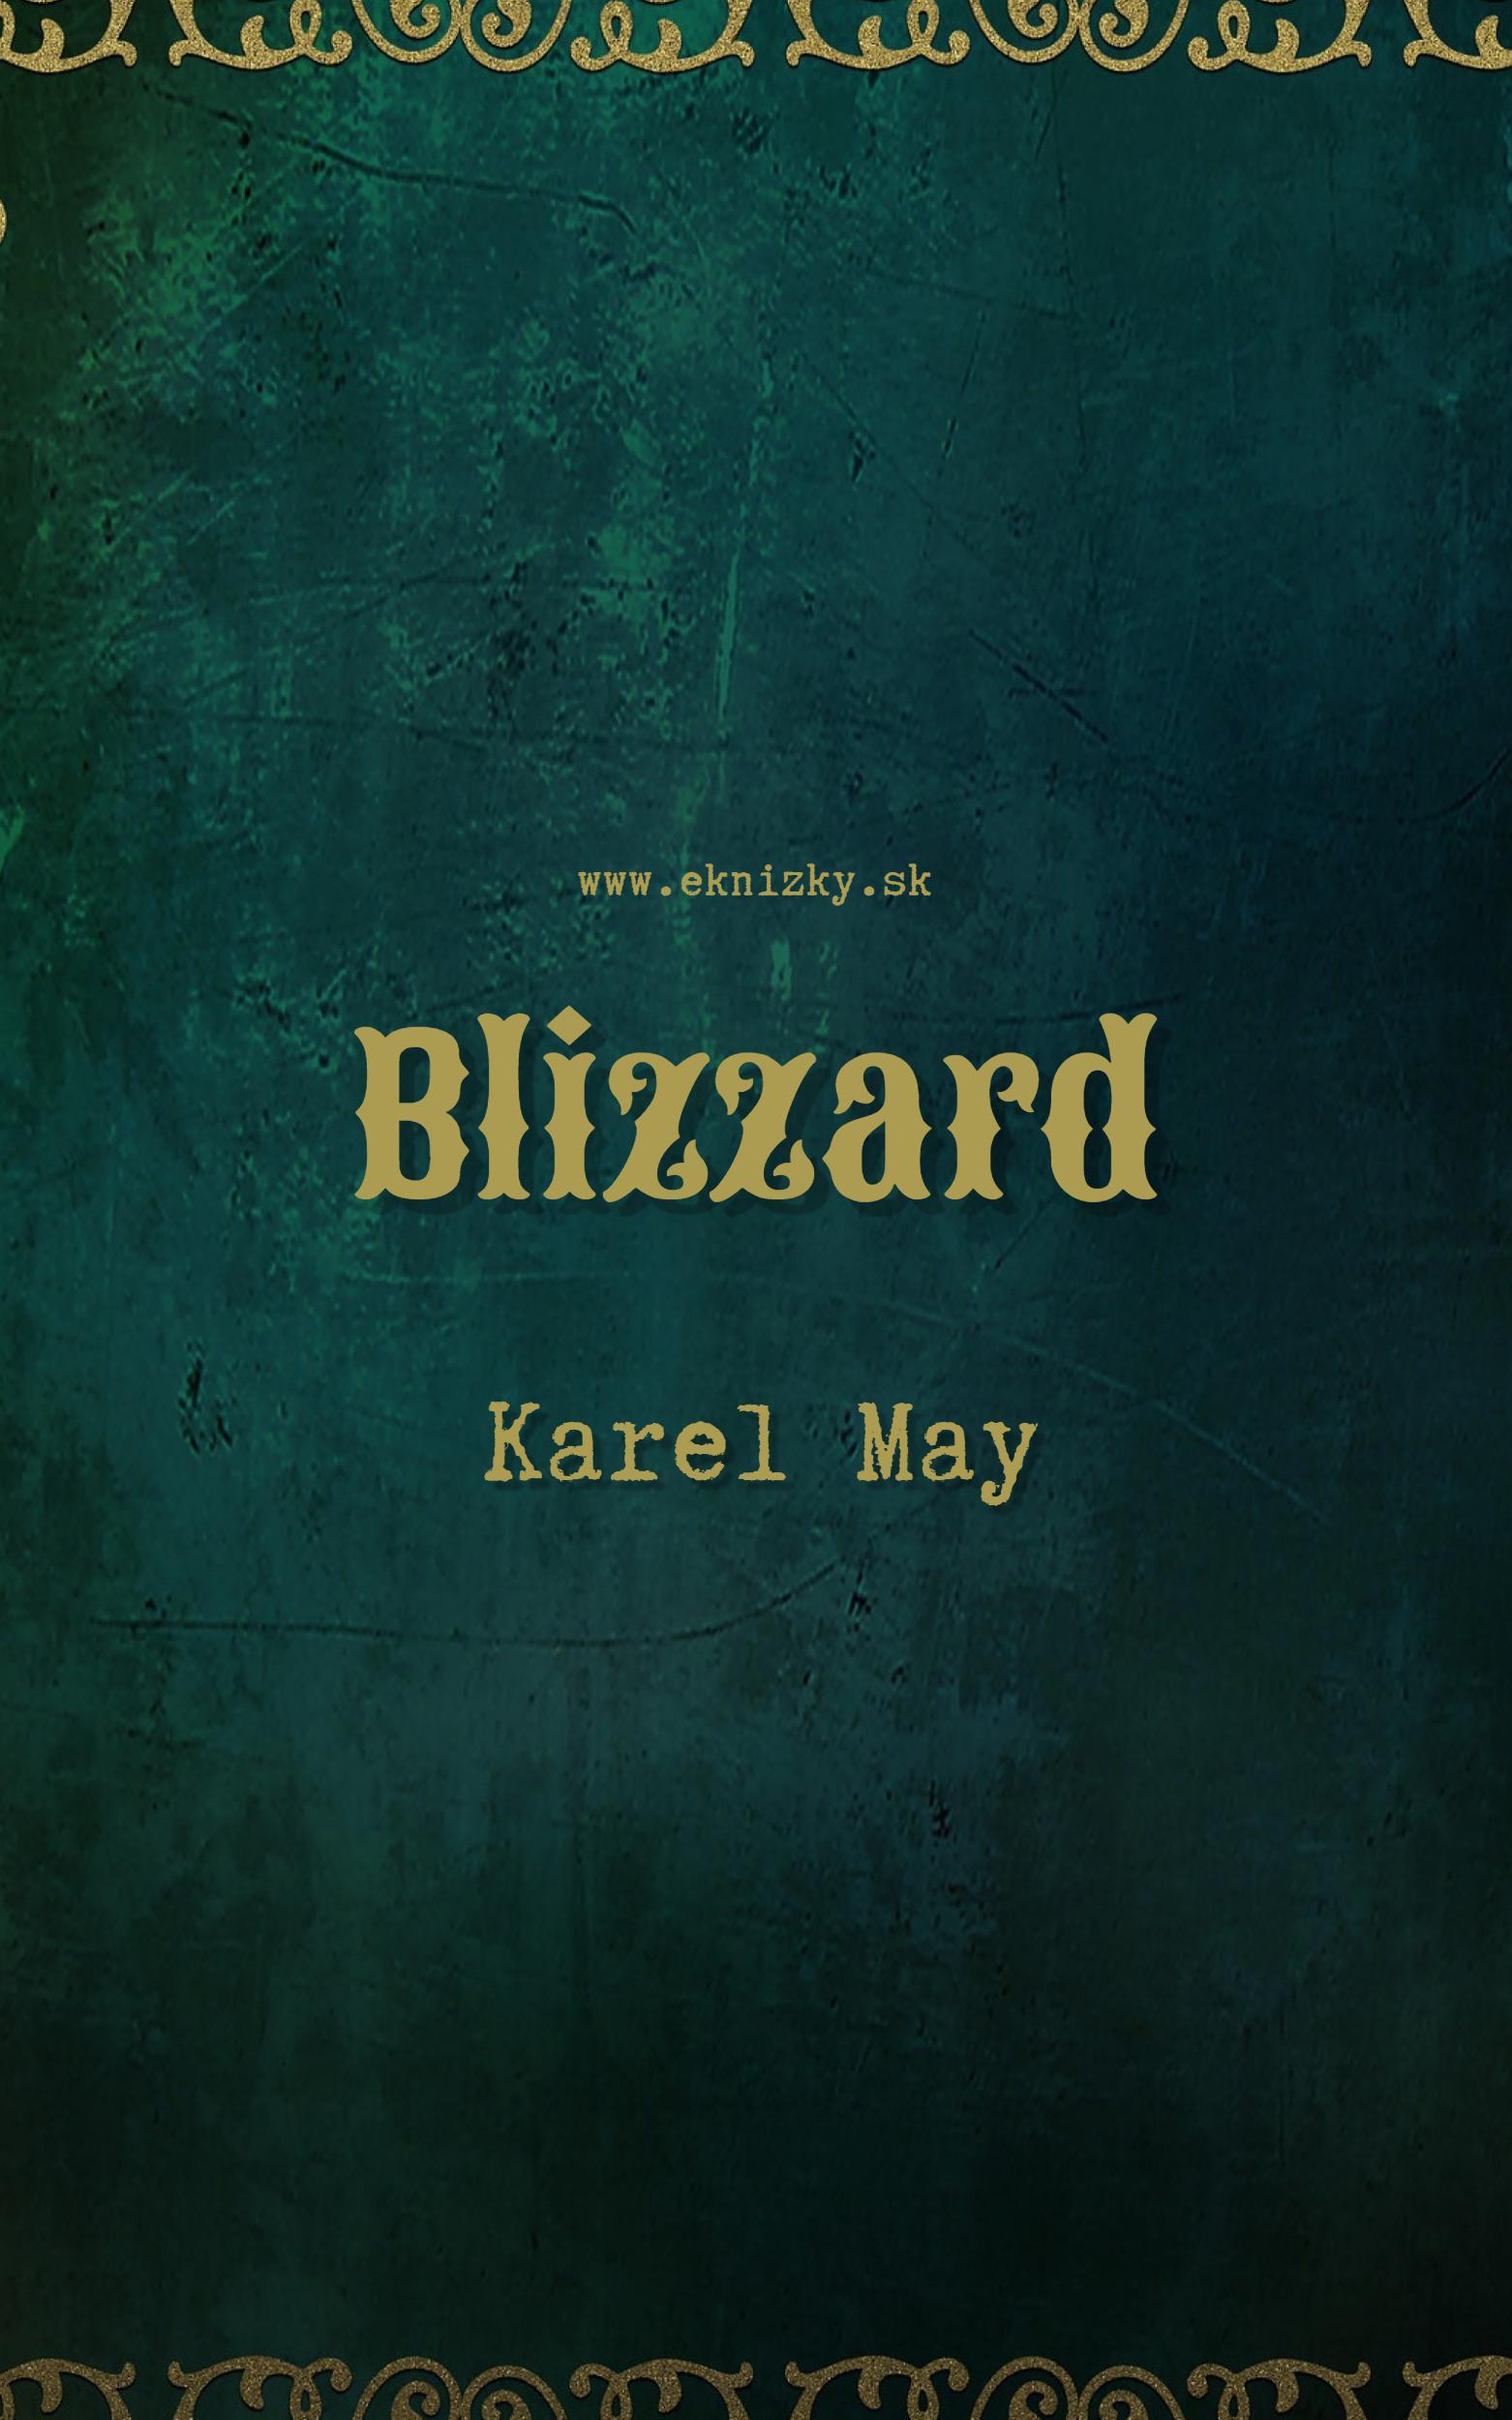 blizzard may eknizky